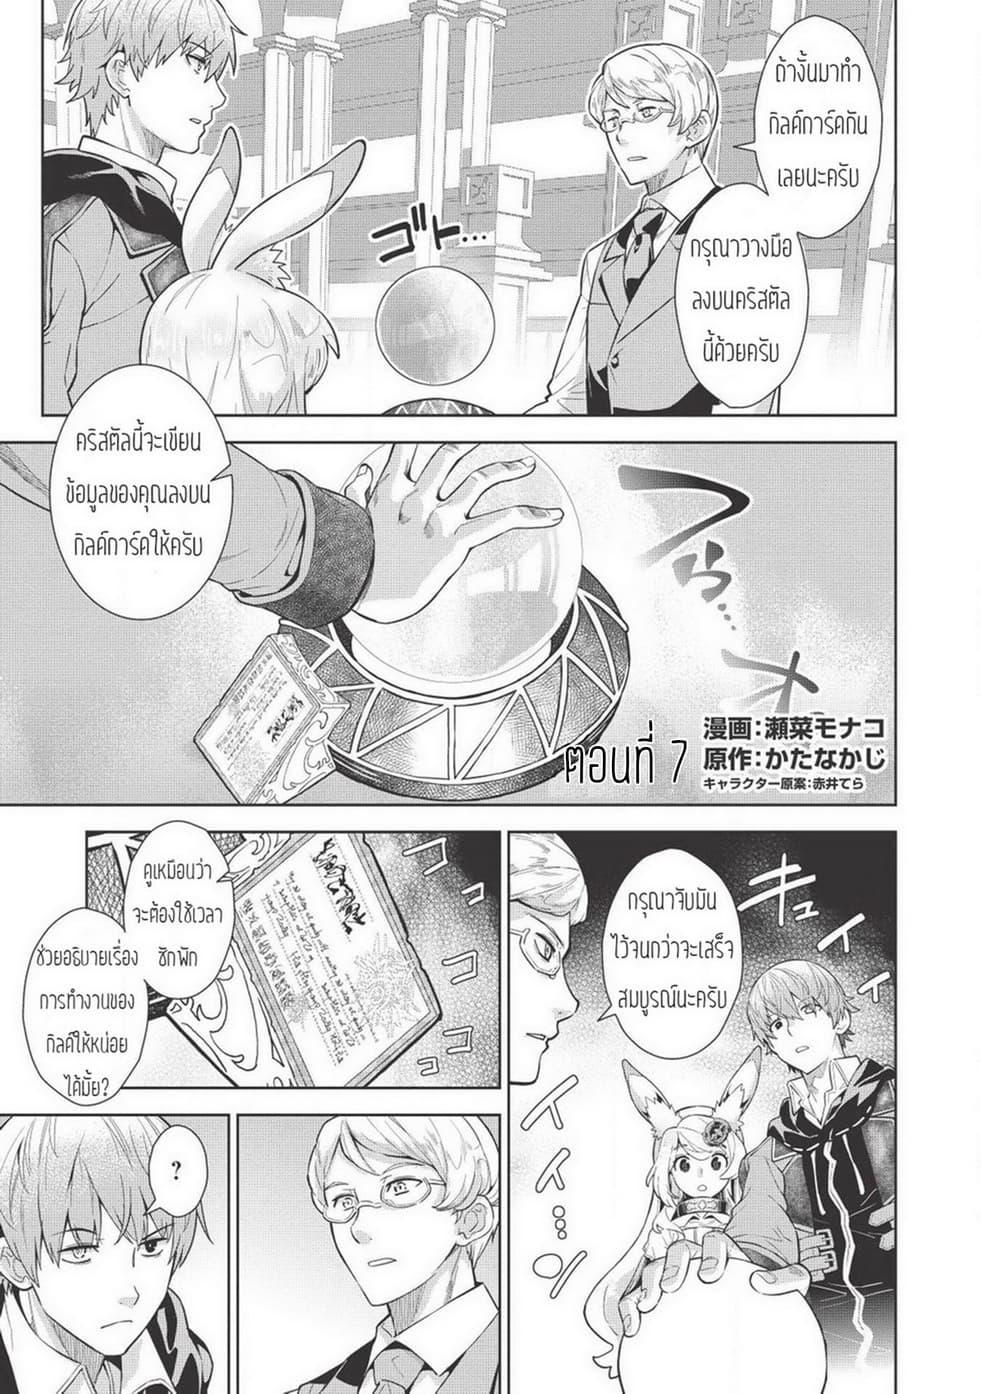 Magan to Dangan o Tsukatte Isekai o Buchinuku!-ตอนที่ 7